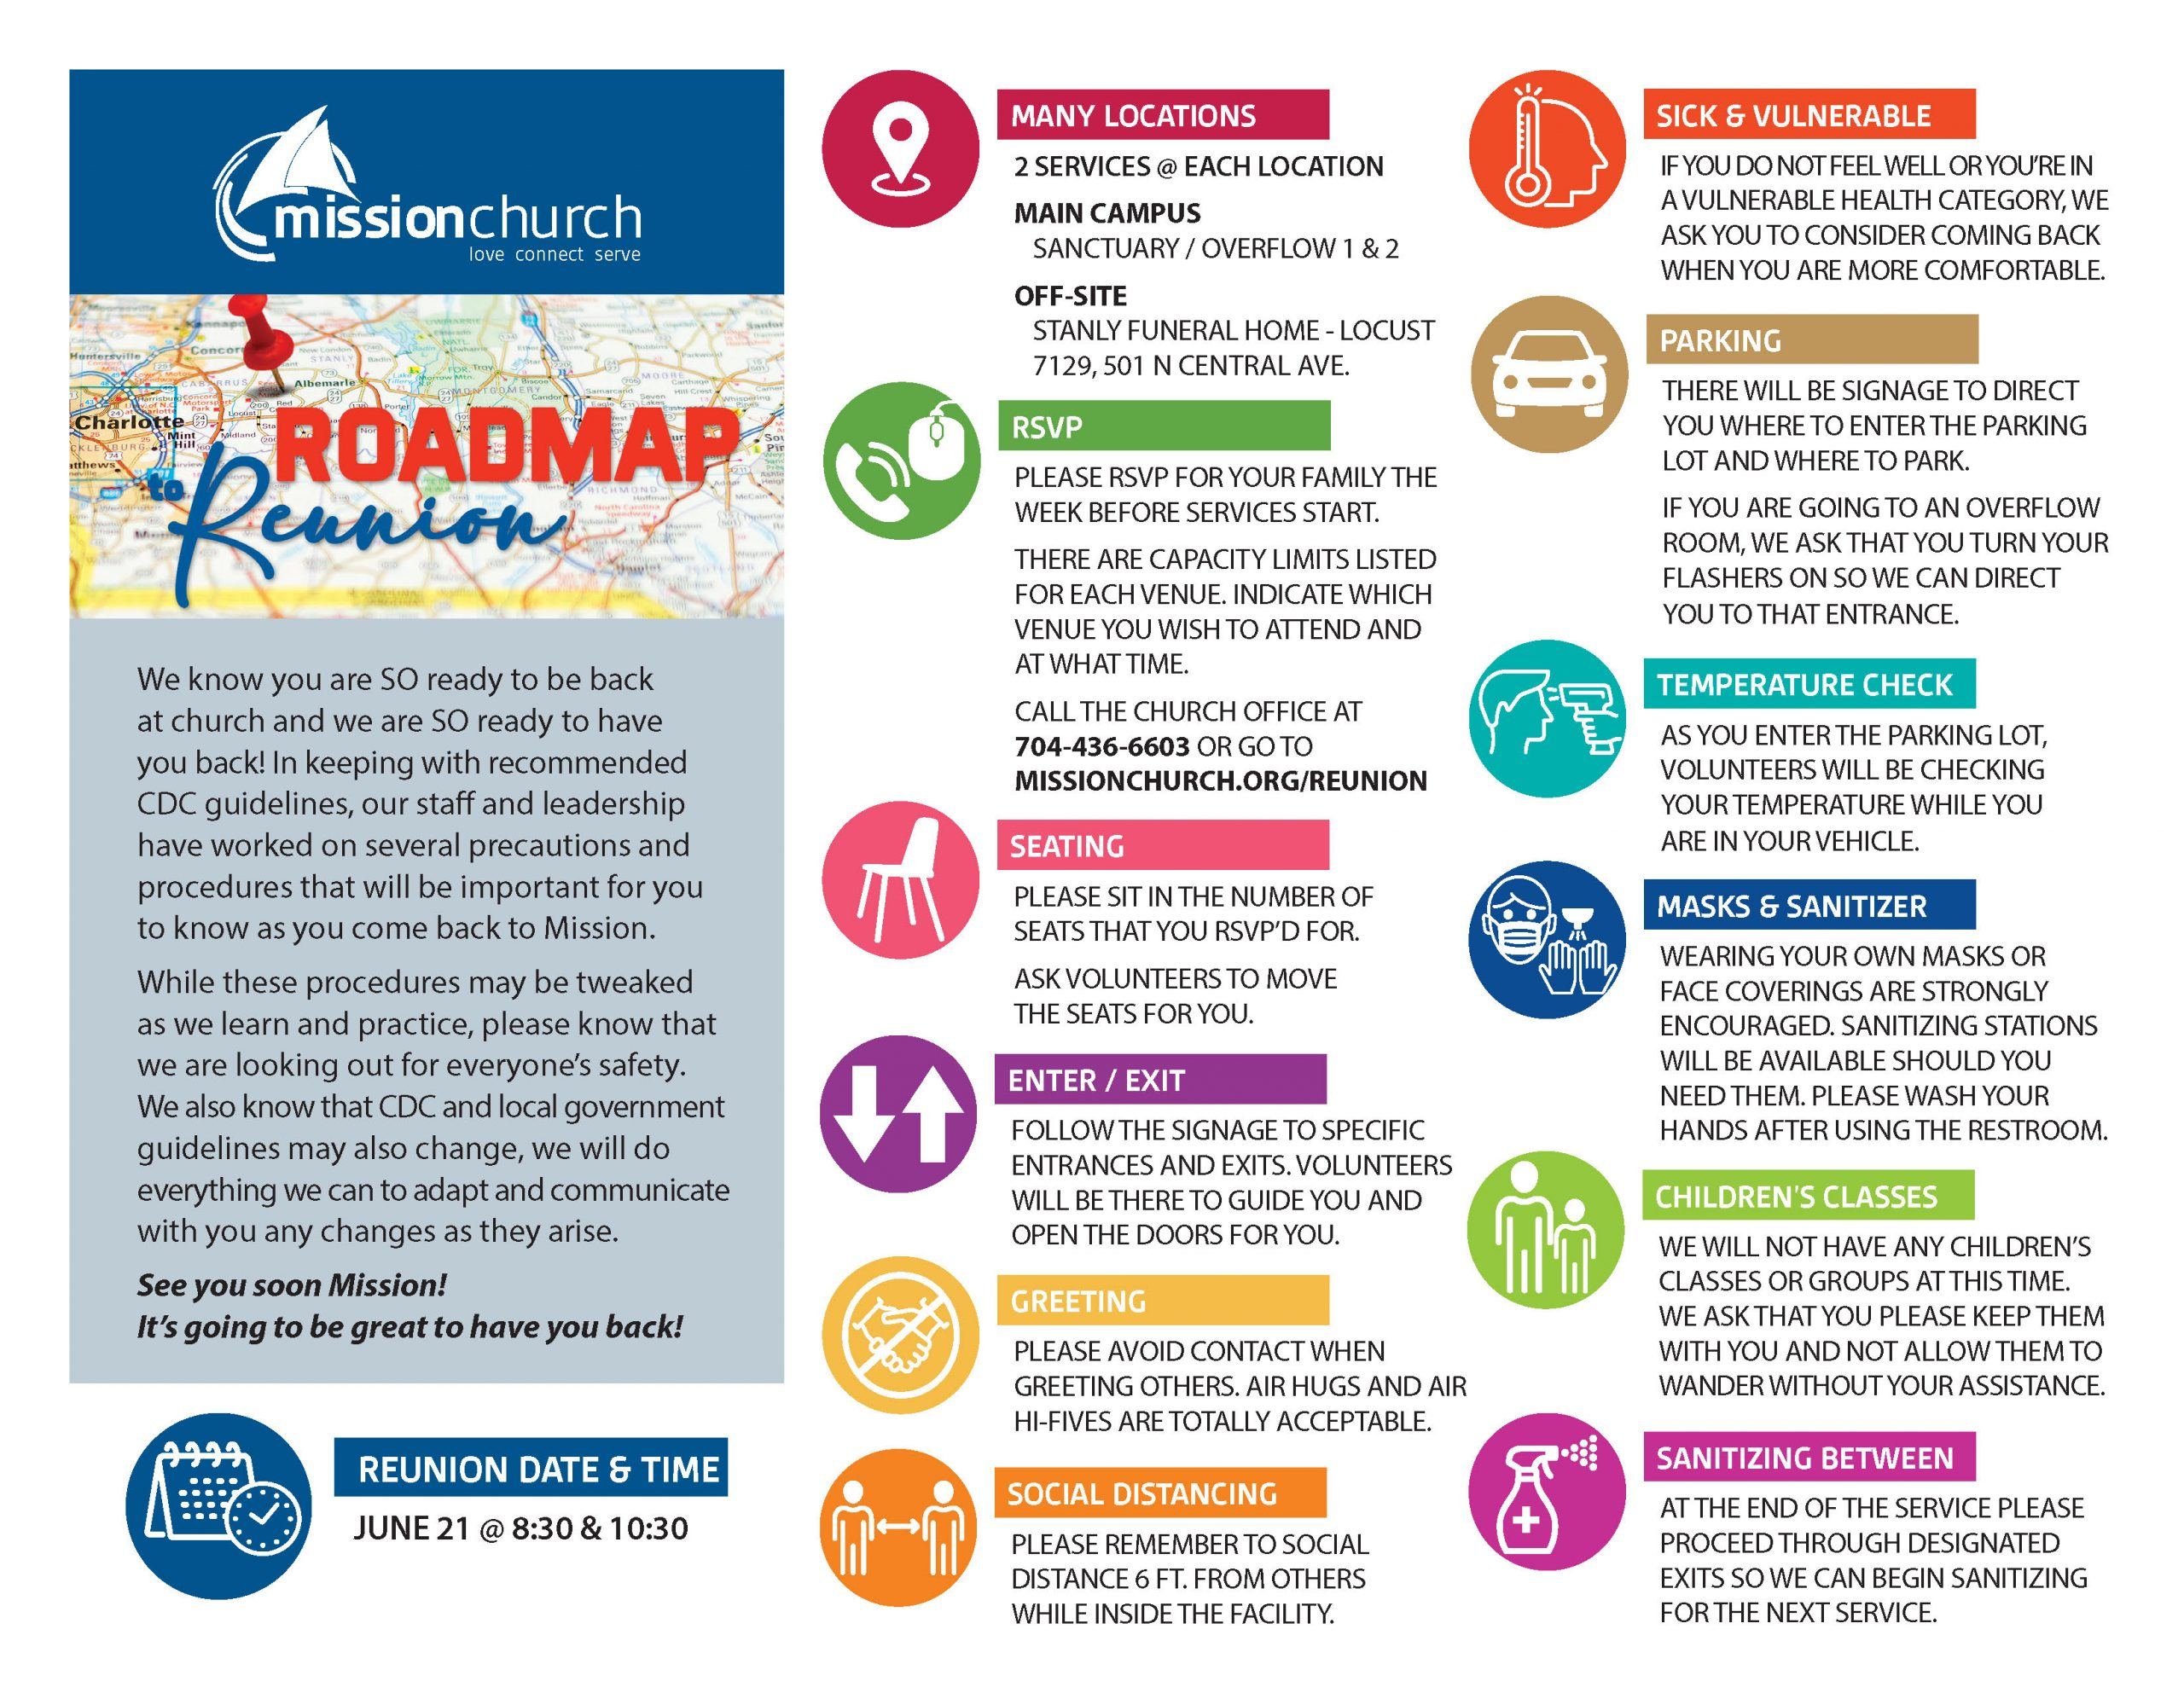 Roadmap to Reunion Precautions